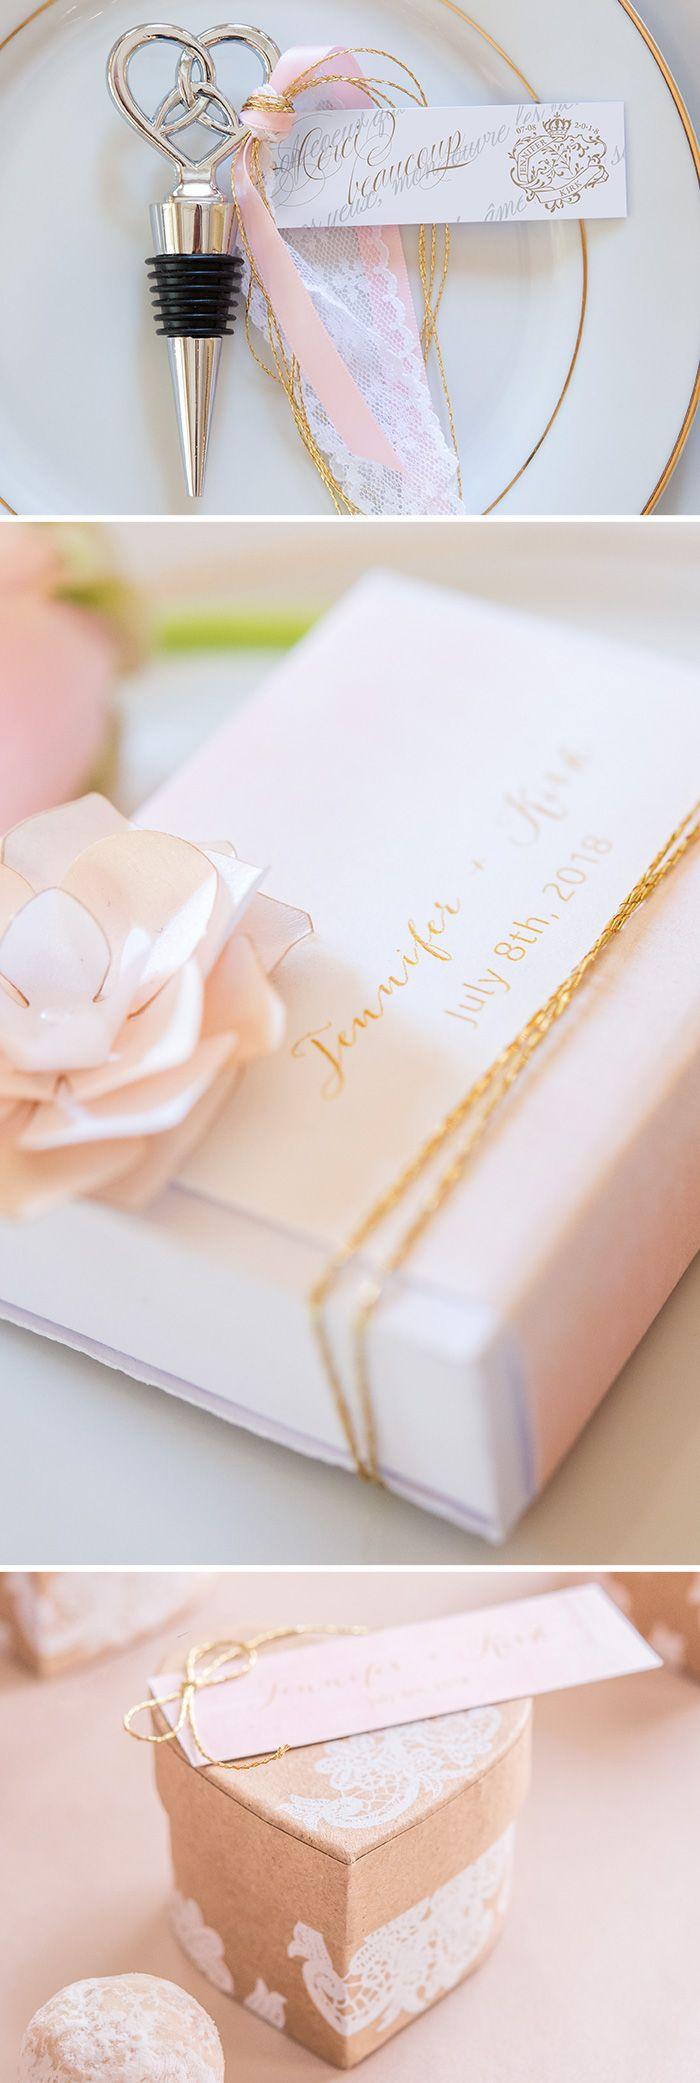 Wedding Favors Wedding Favor Ideas Wedding Party Favors - satukis.info